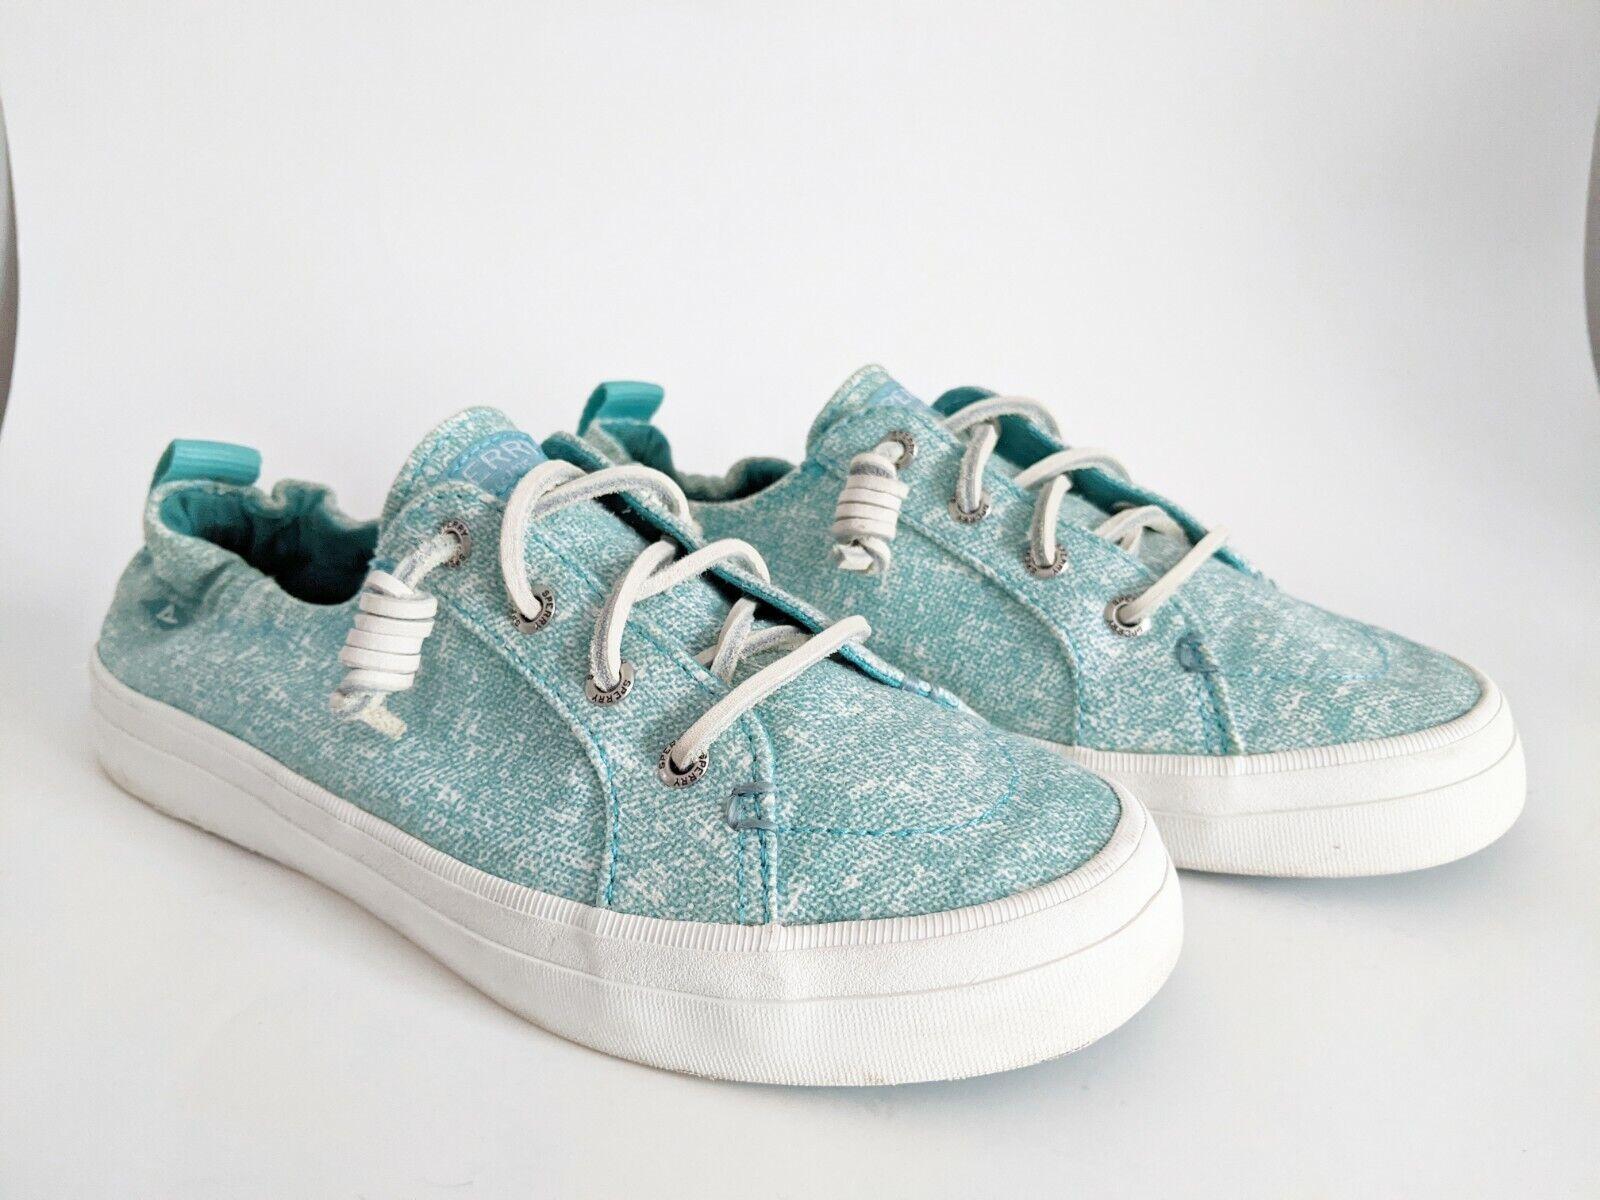 Sperry Top-Sider Women's Crest Ebb Turquoise Sneaker Shoe 6.5 Slip On Boat Shoe